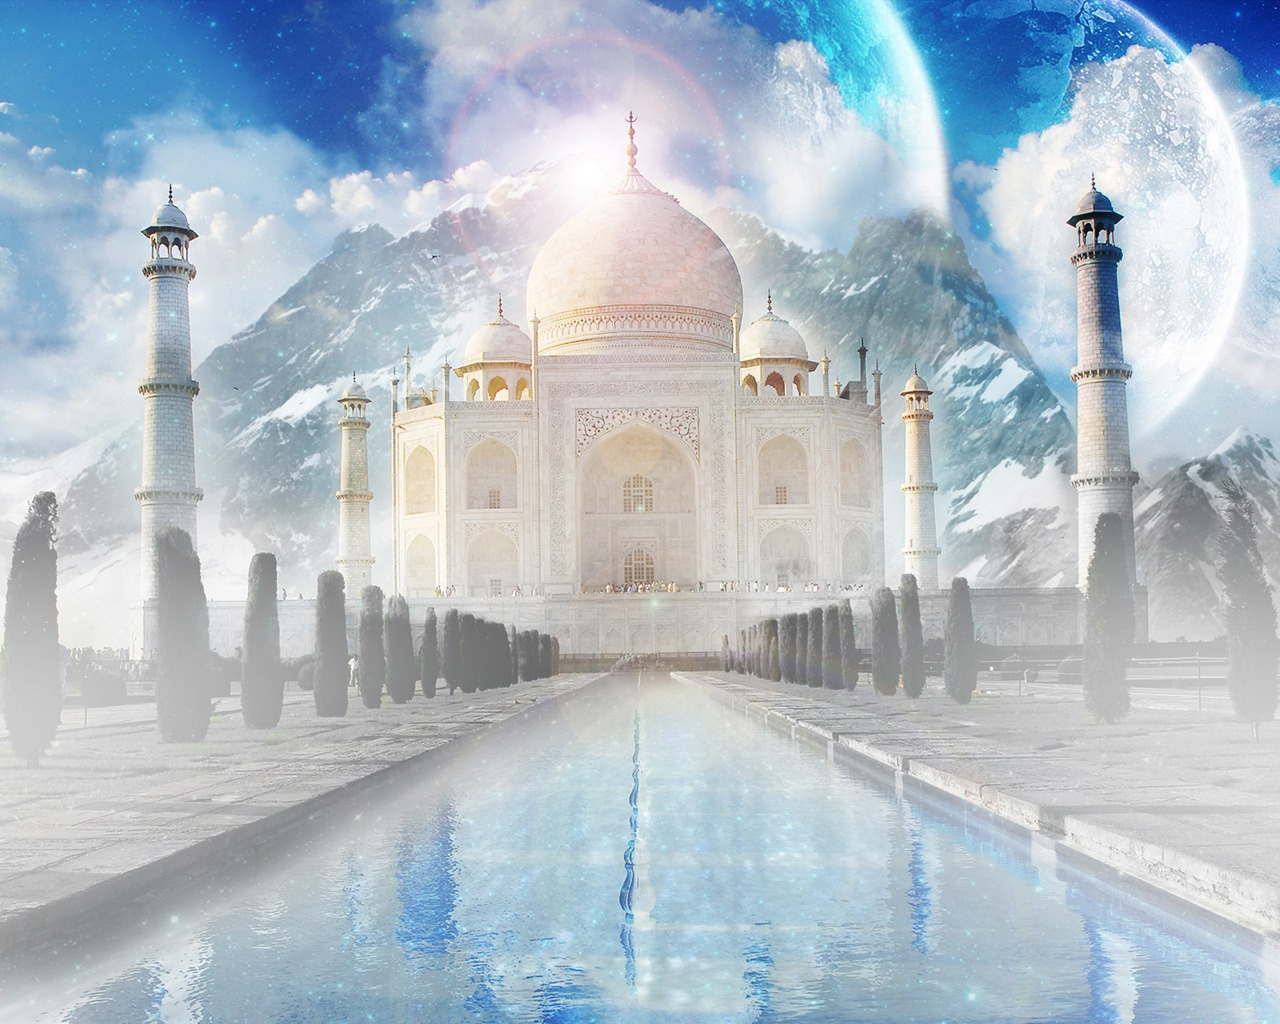 The Taj Mahal Wallpaper India World Wallpapers In Jpg Format For